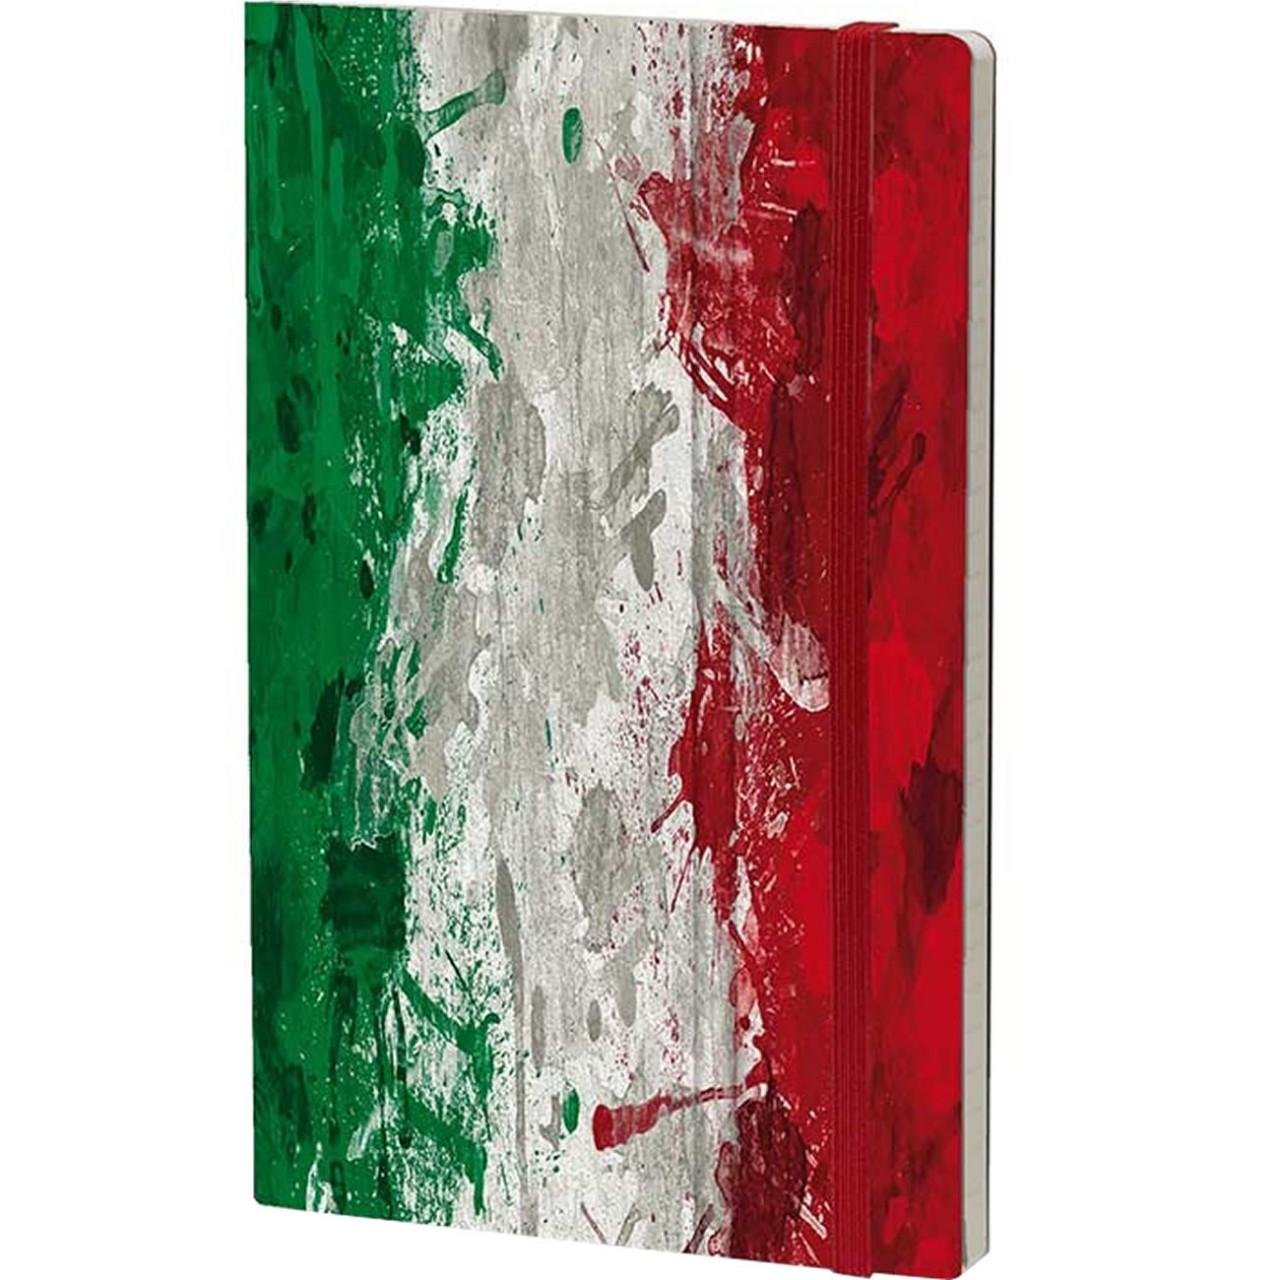 Stifflexible Notizbuch HISTORICAL NOTES 13 x 21 cm 192 S., ITALIANS DO IT BETTER (Italy Flag)